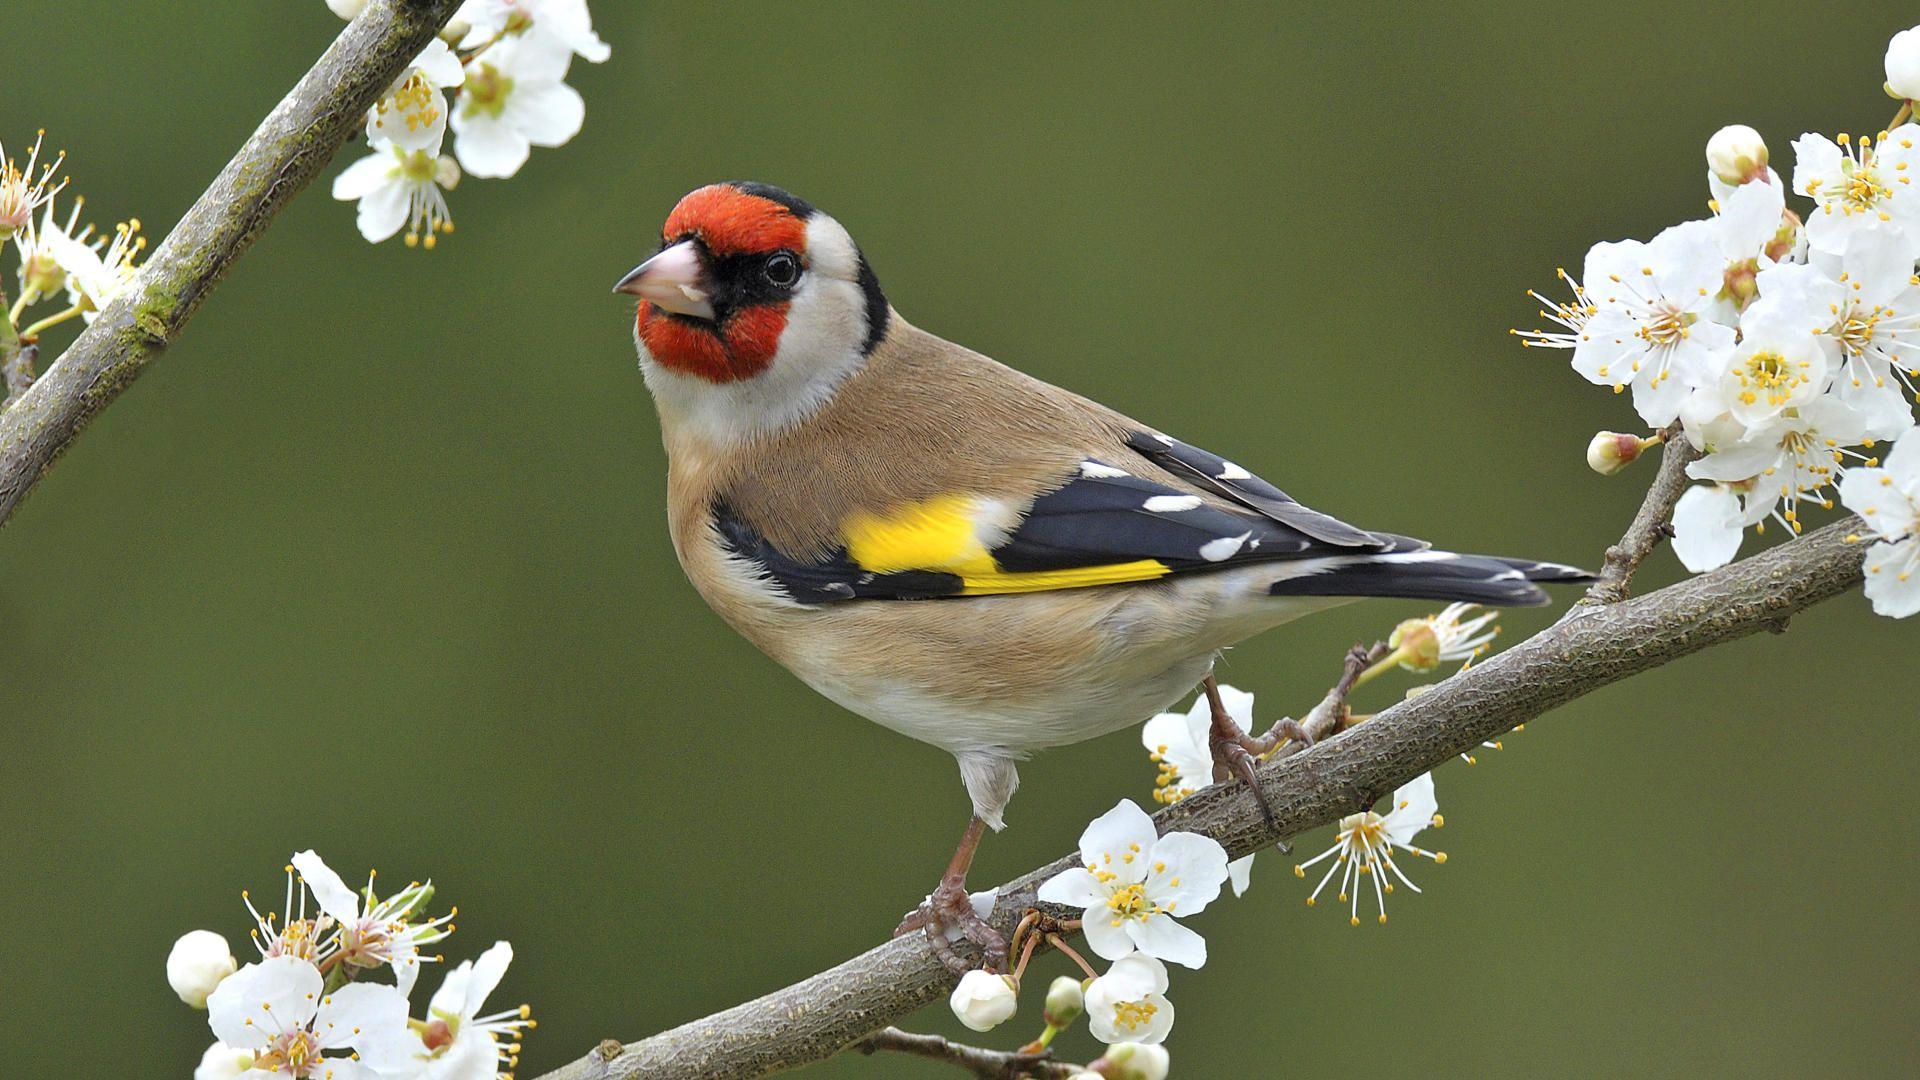 European Goldfinch Wallpaper Goldfinch Beautiful Birds Birds